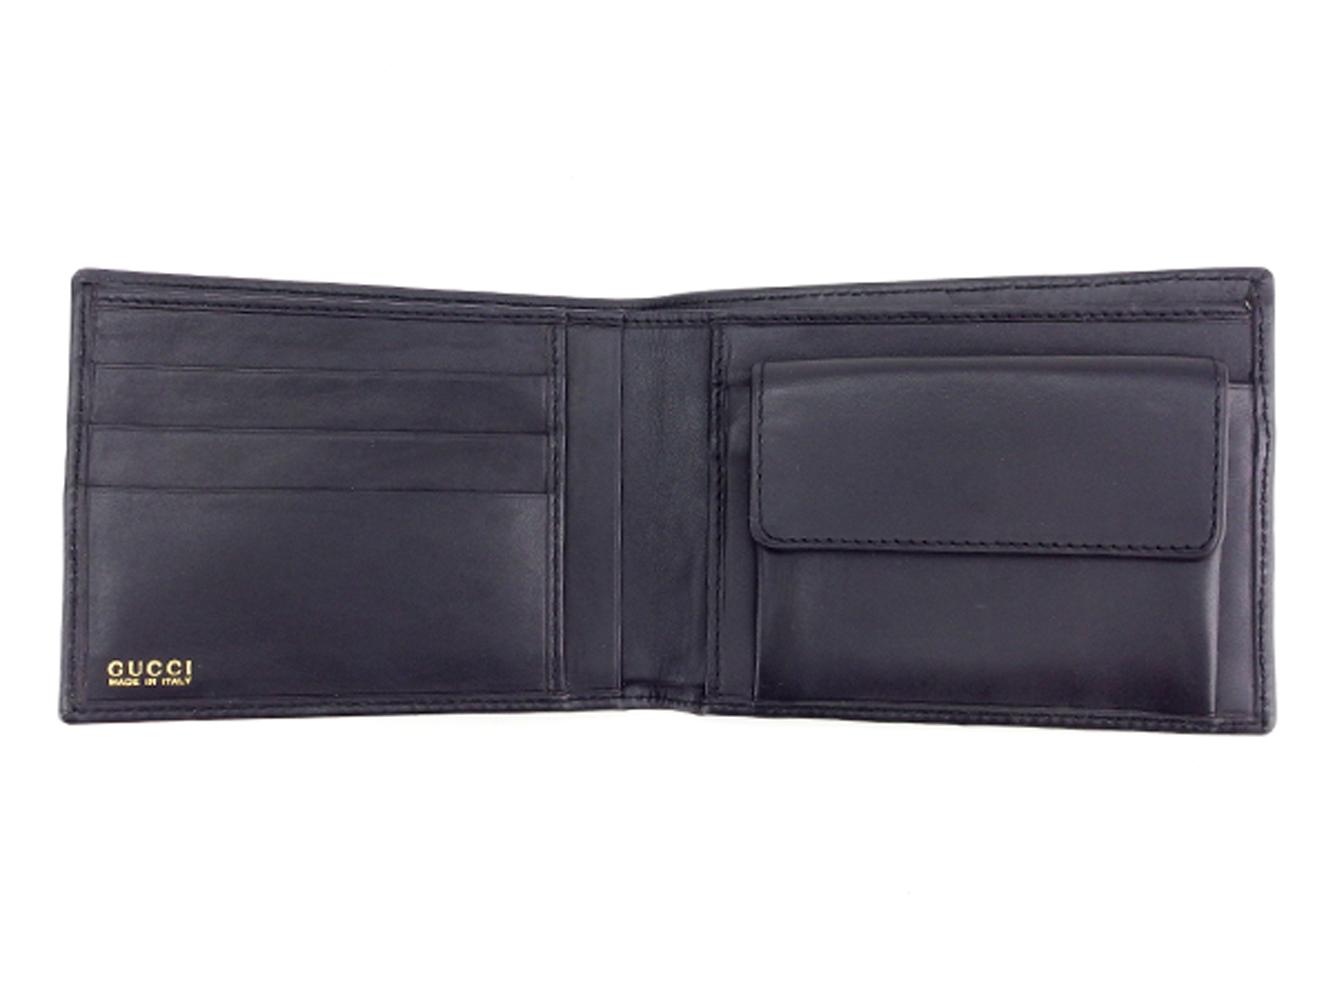 339c0739143c グッチ GUCCI 二つ折り財布 フェンディ セリーヌ 財布 メンズ可 ブラック ...